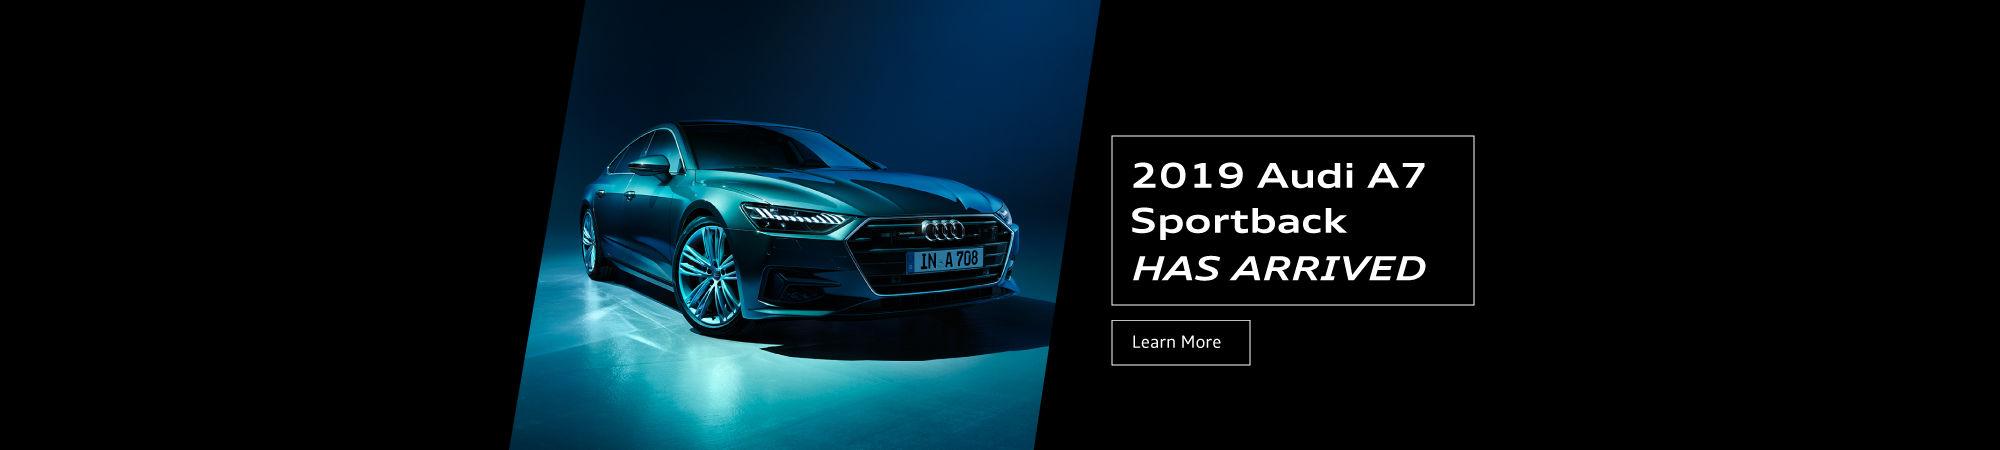 2019 Audi A7 Sportback Has Arrived